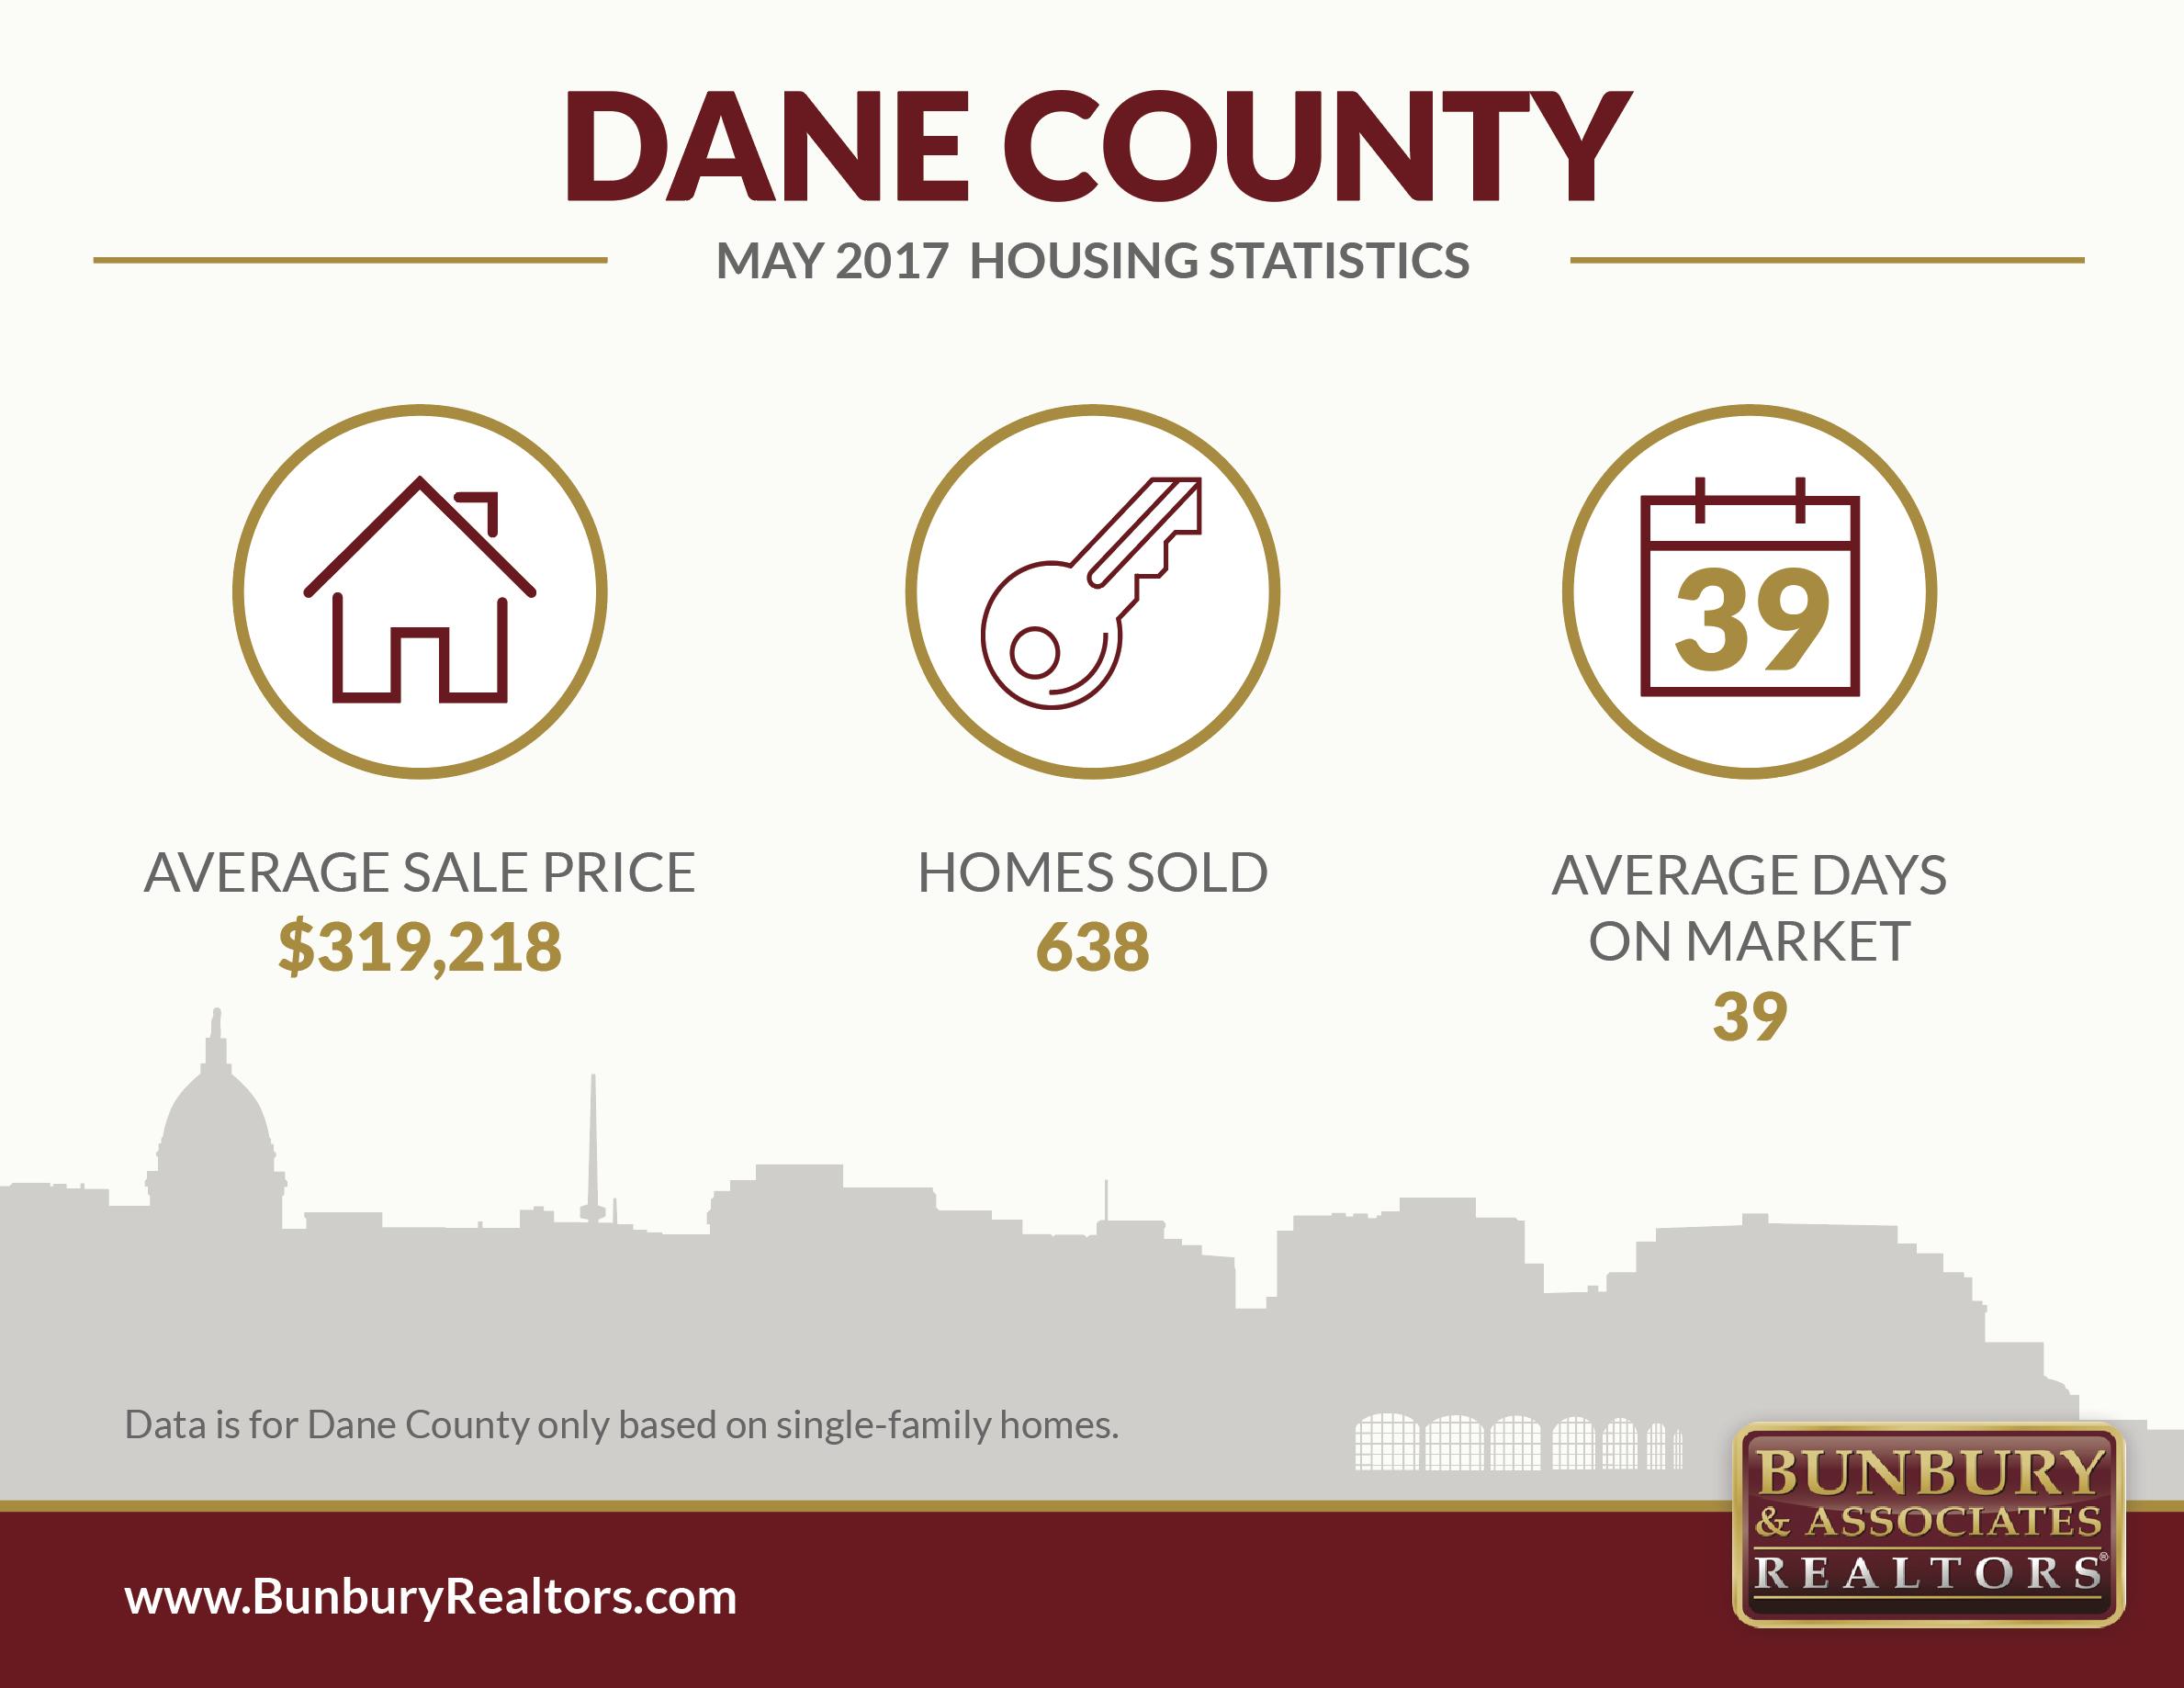 dane county may